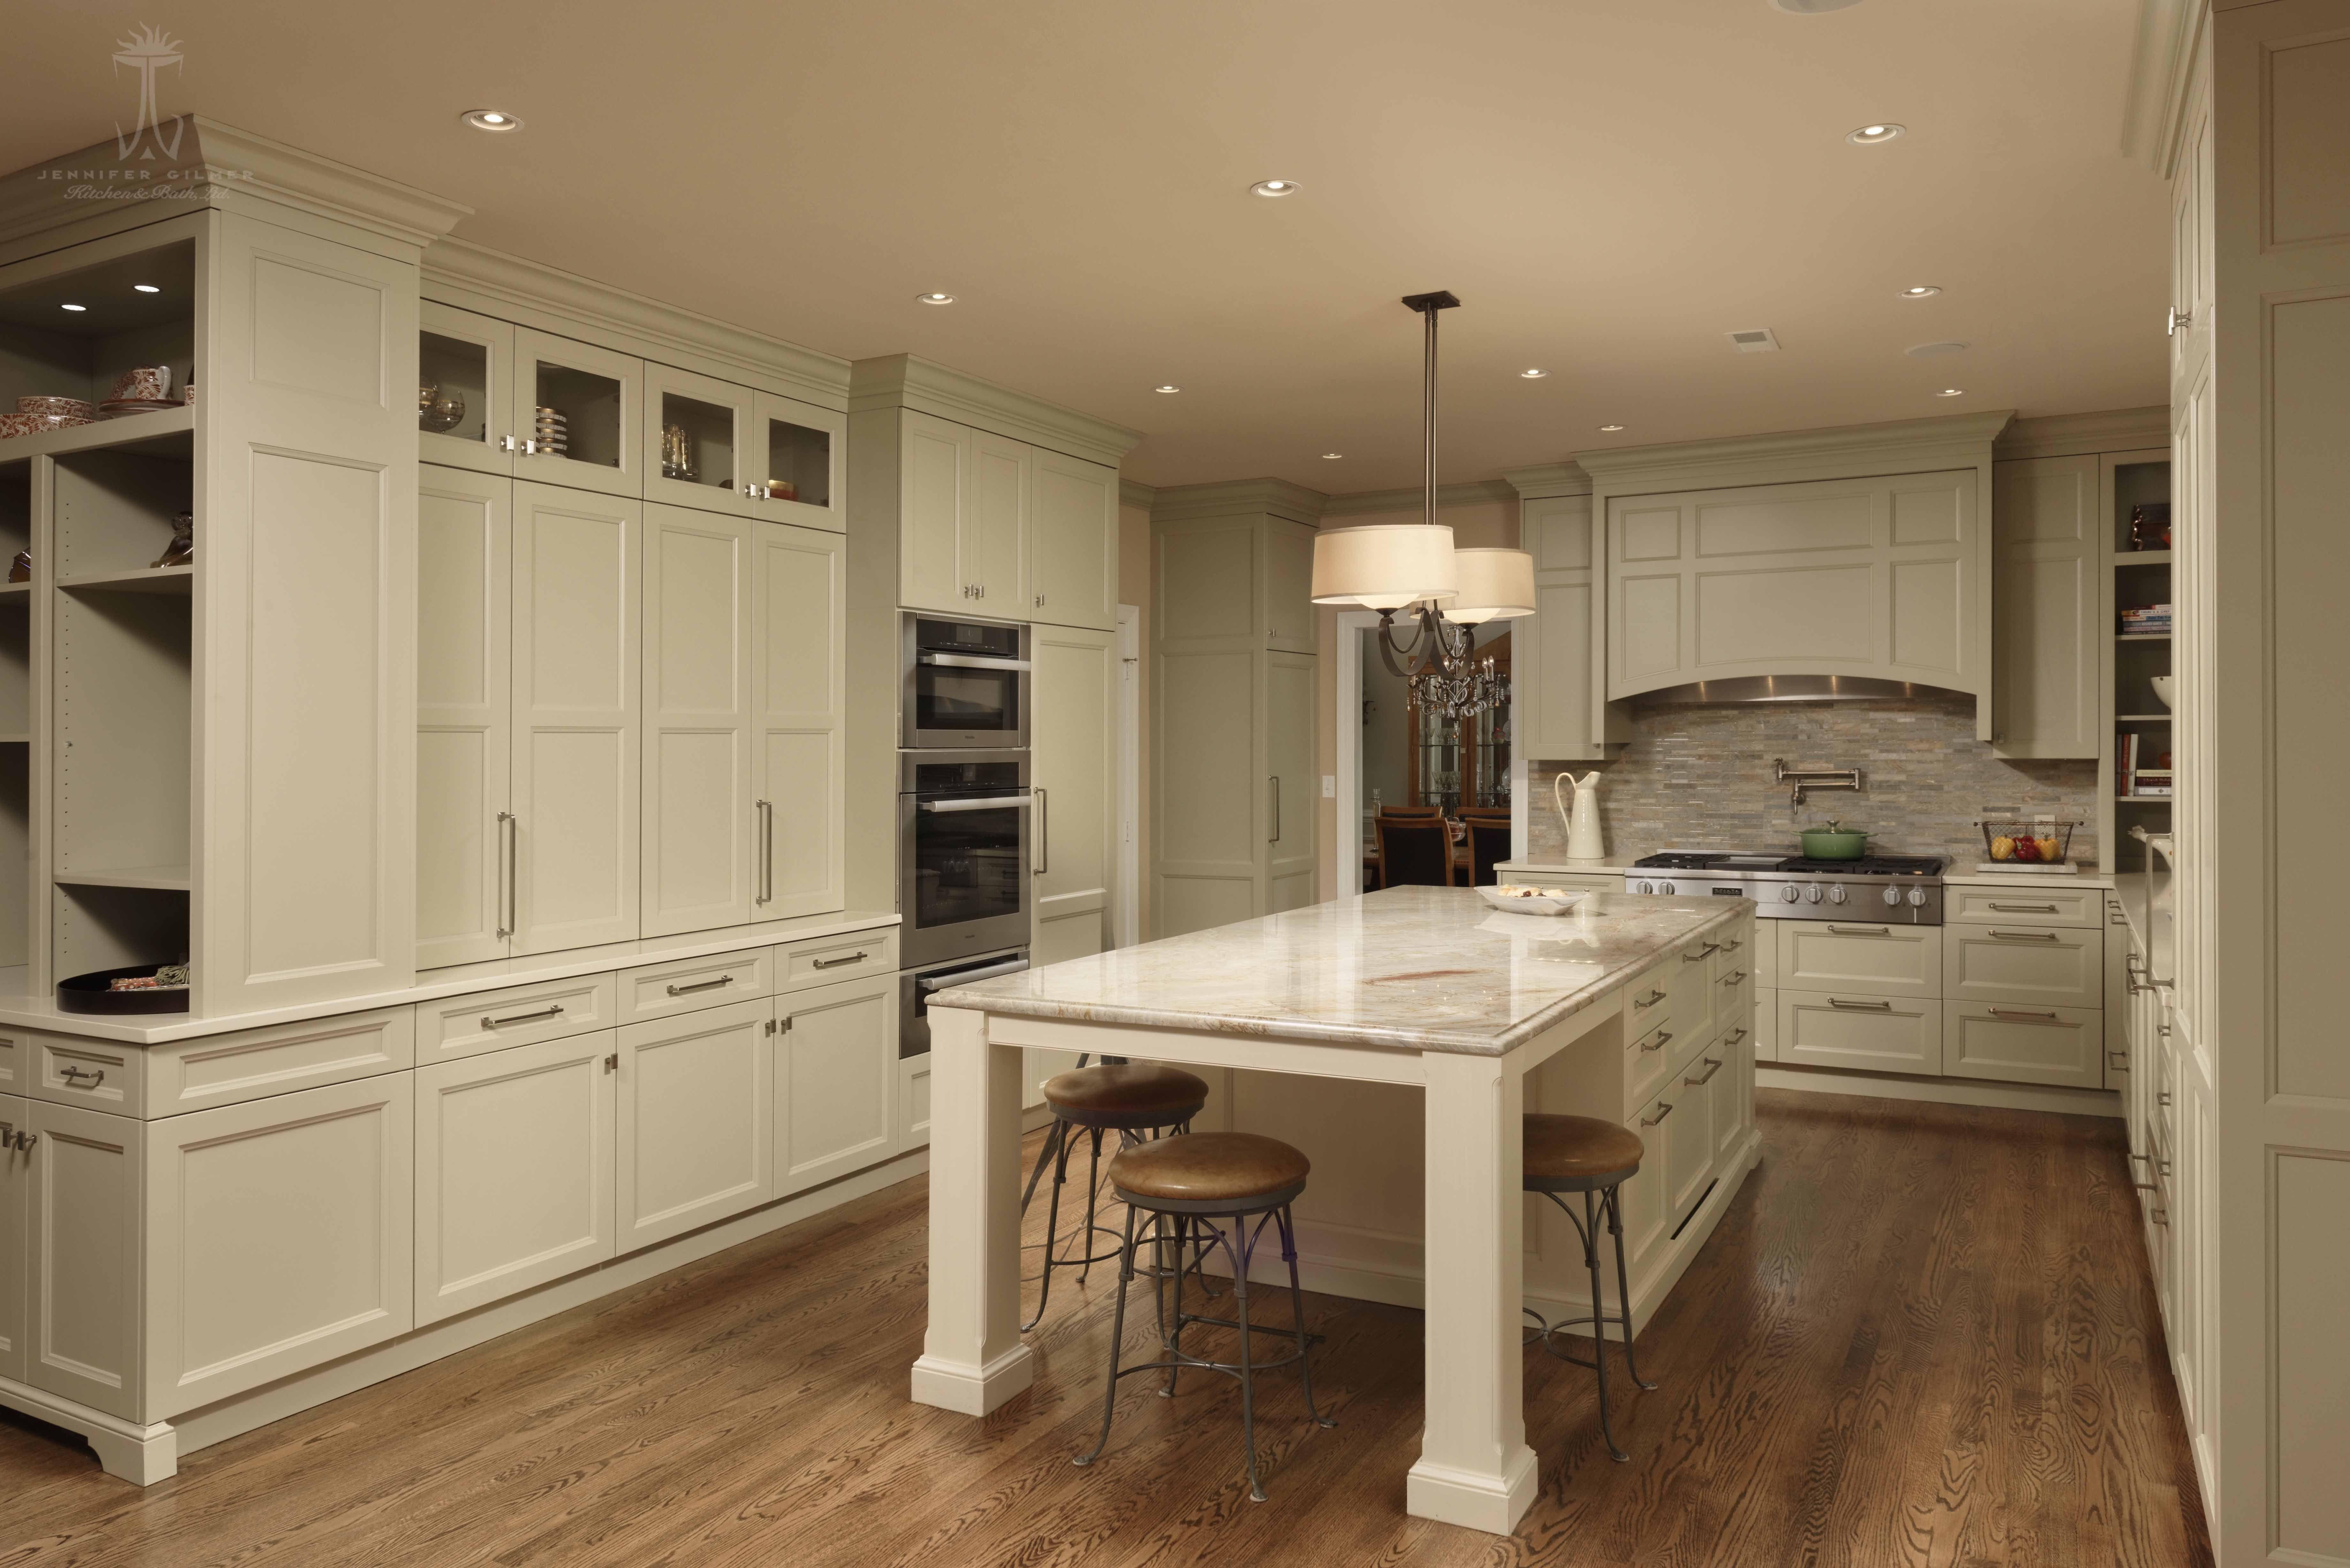 mullet s freezer brands with sub glass fl door drawers zero sarasota classic appliances pro